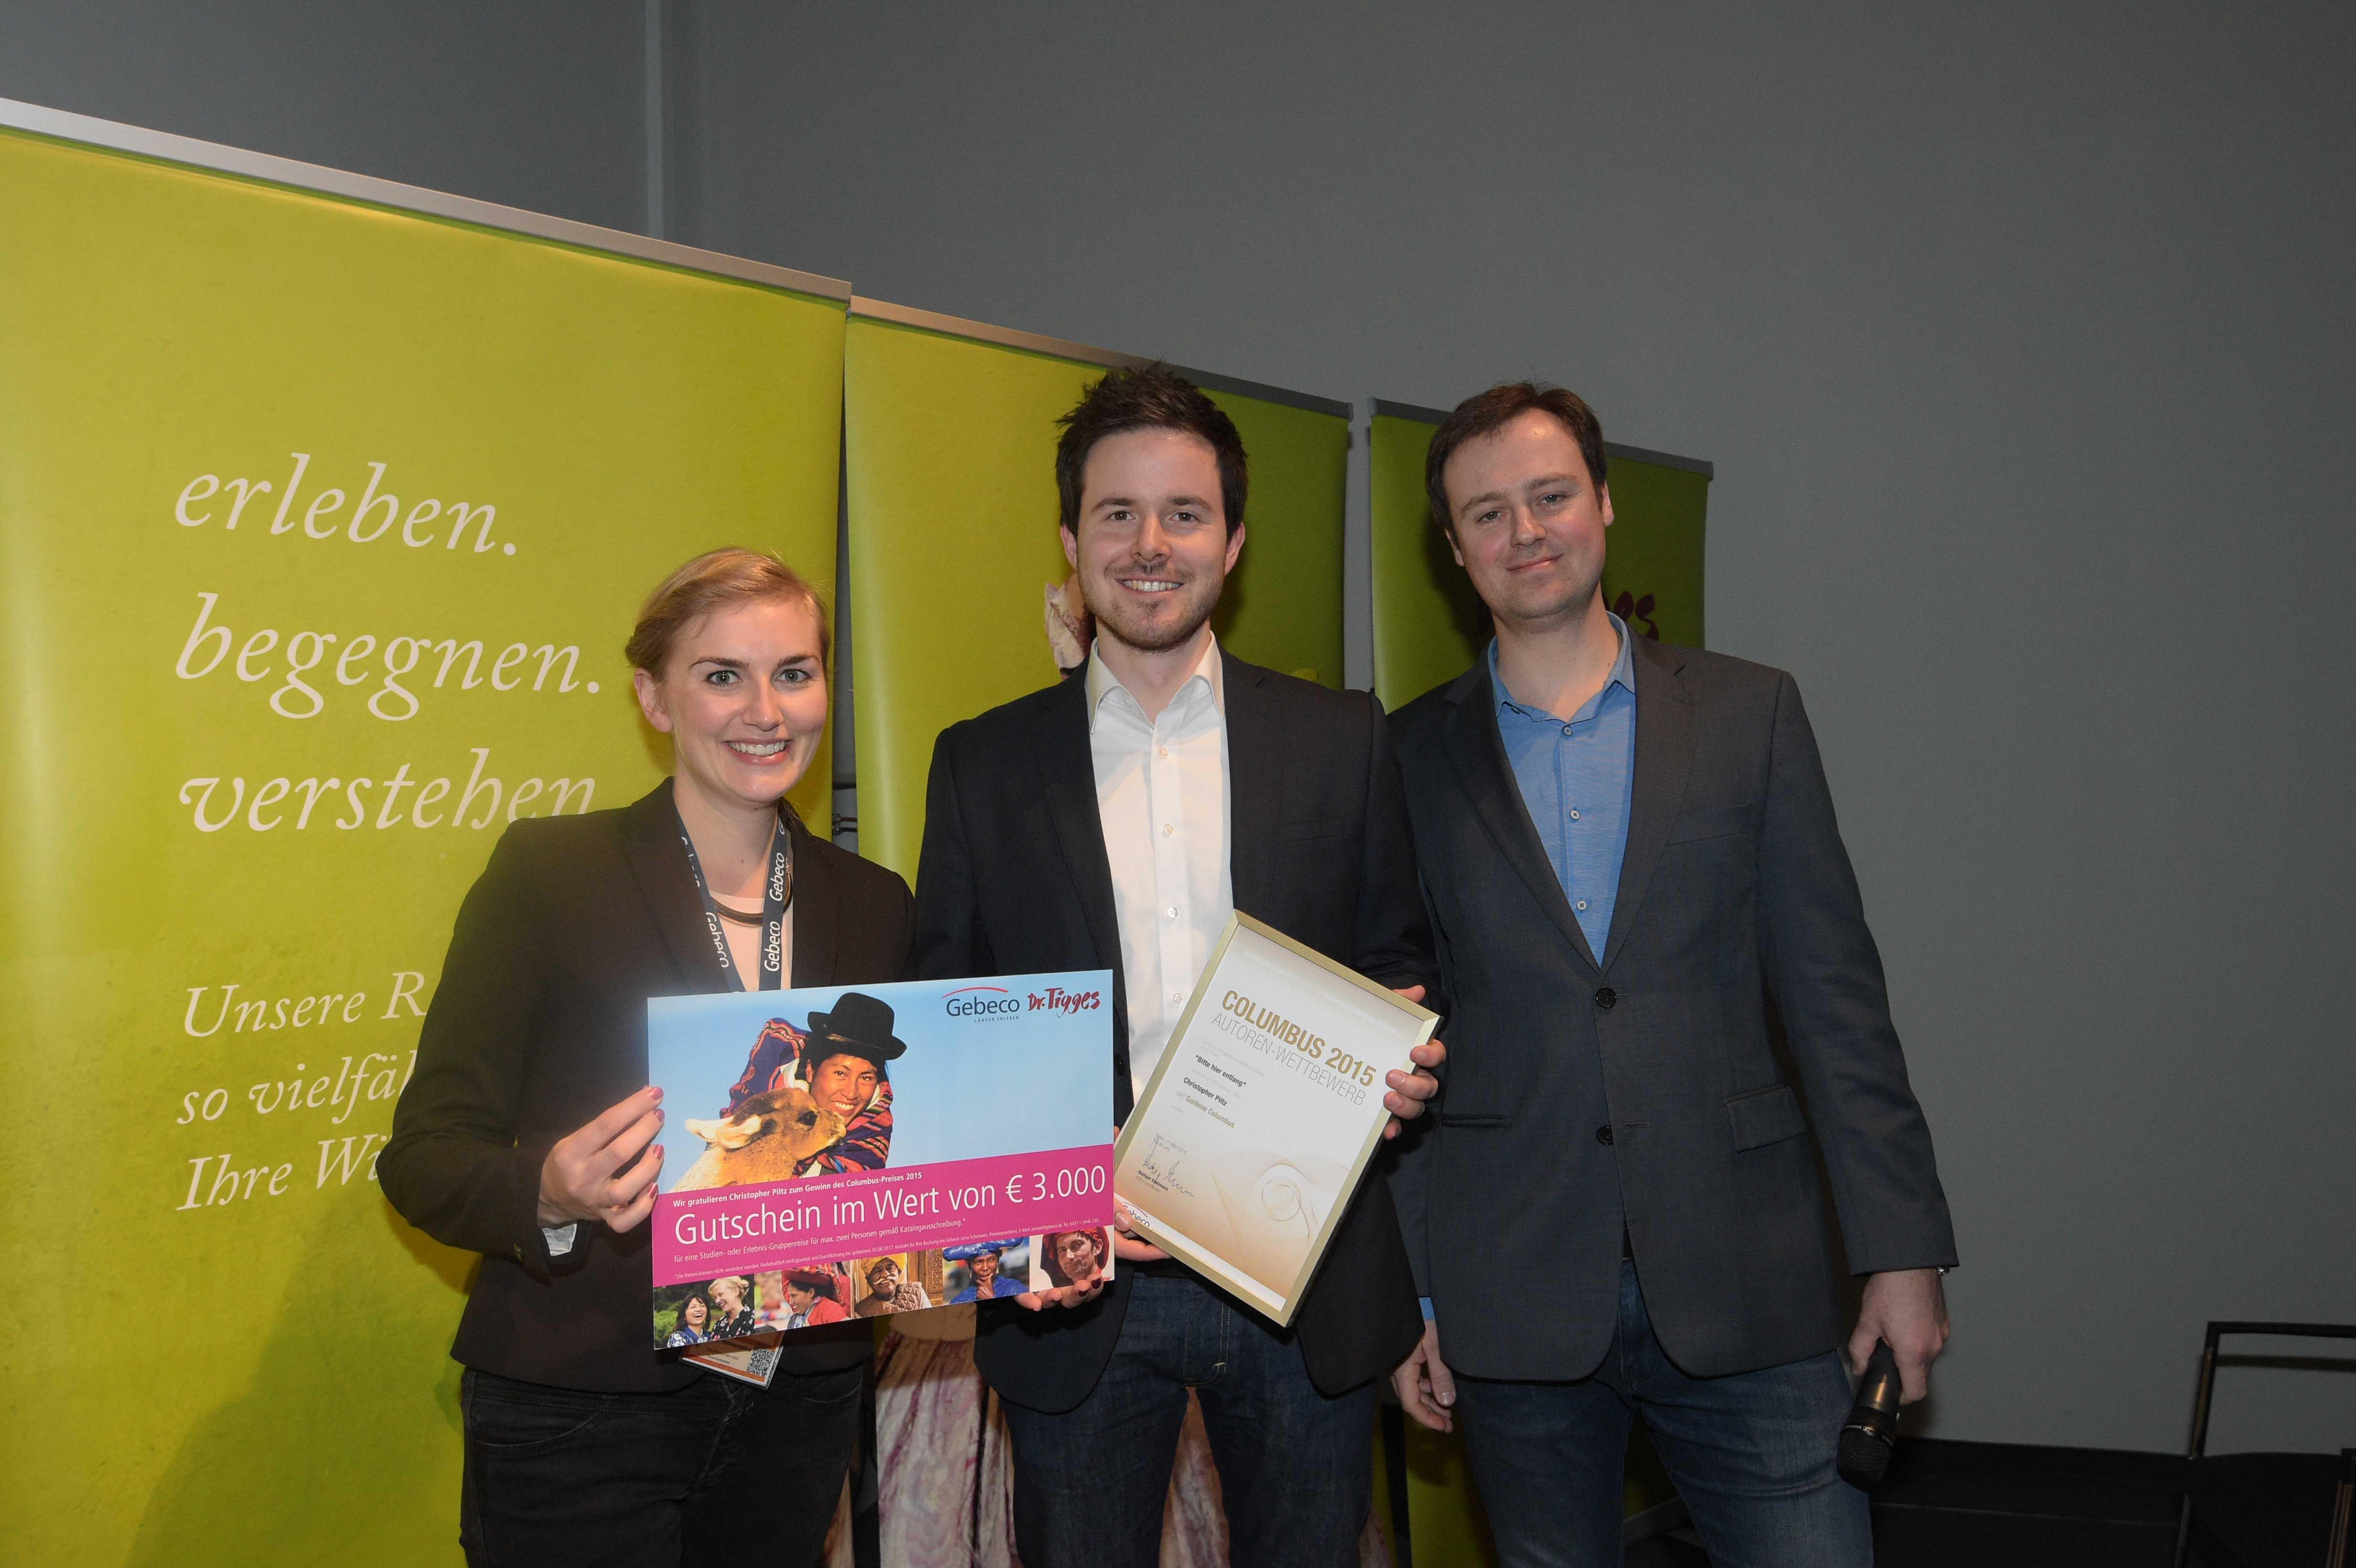 Columbus Autorenpreis 2015 VDRJ-Autorenpreis Gold kurz GeBeCo Sprecherin Lena Schumann und Christian Leetz und Christoph Piltz web